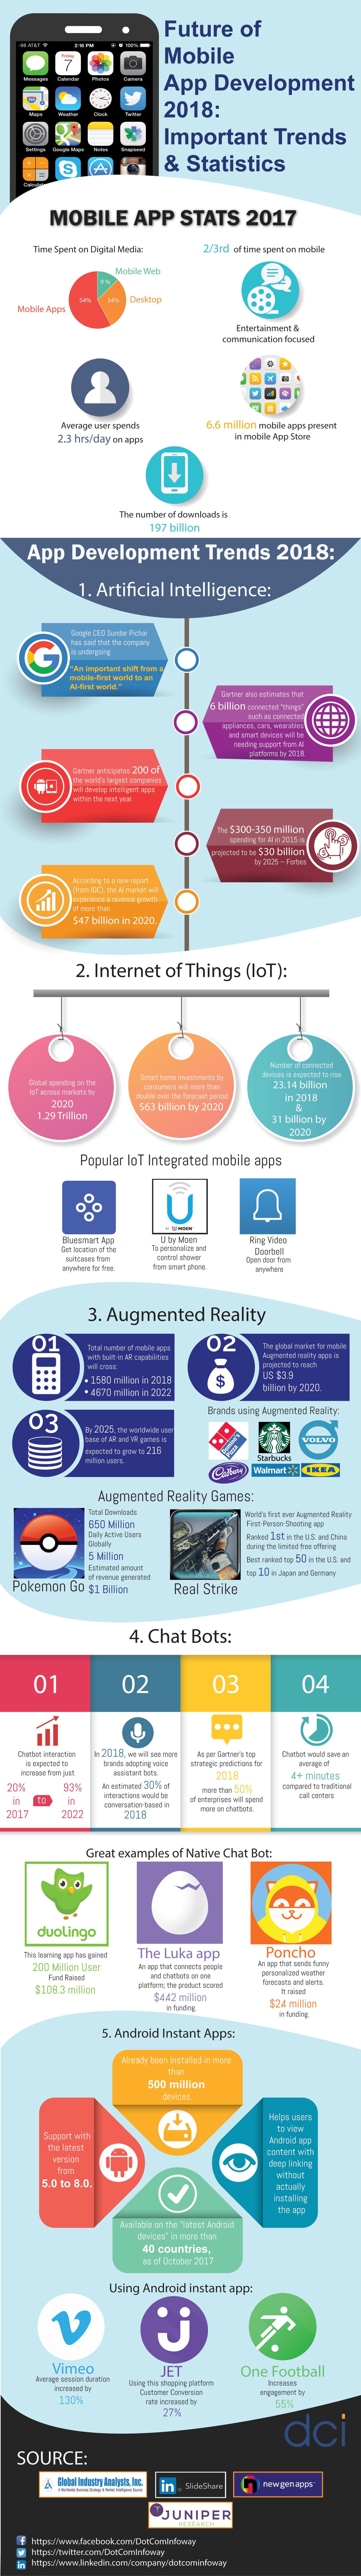 Mobile-App-Development-2018 InfoGraphic